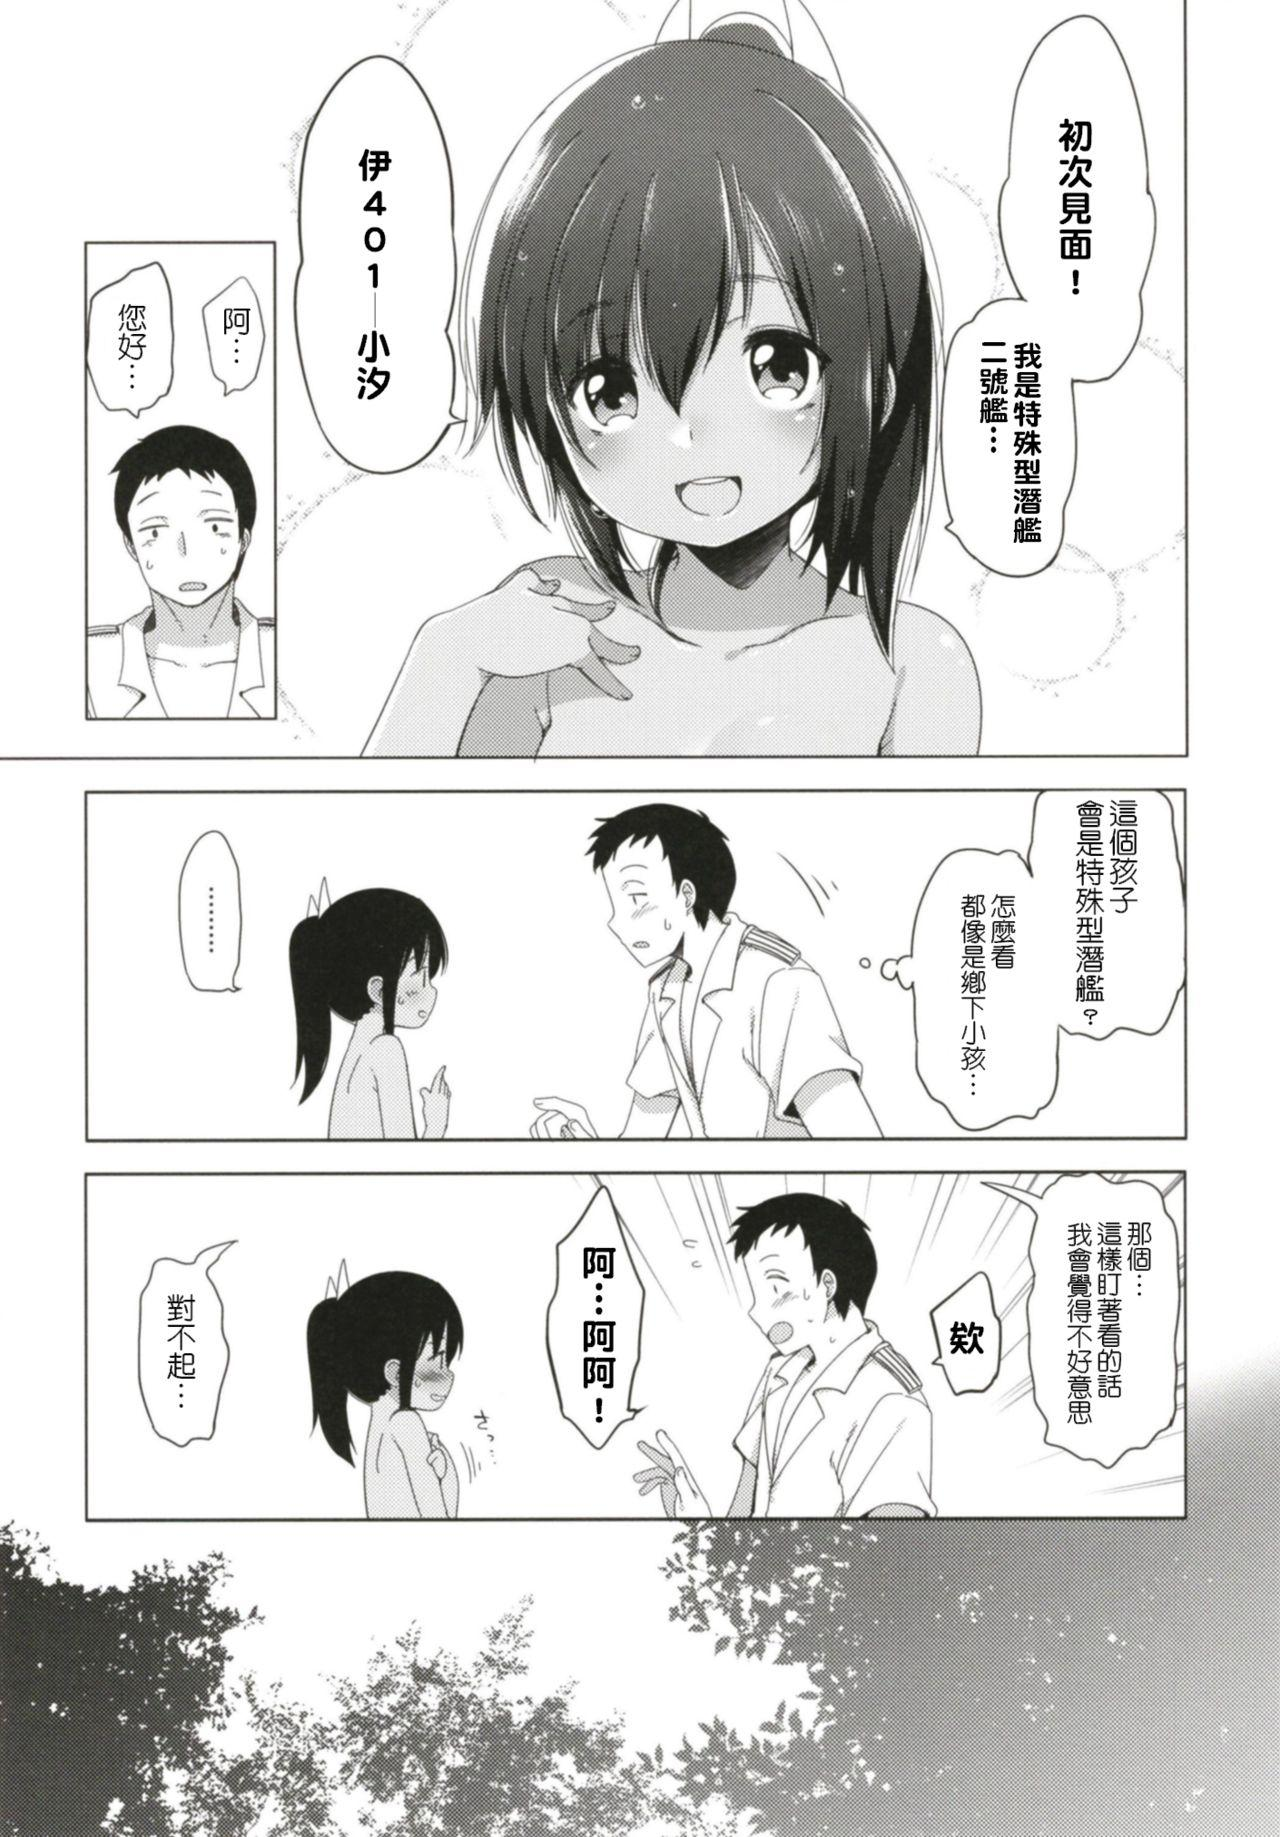 [French letter (Fujisaki Hikari)] Hitonatsu no Ayamachi -I-401 Soushuuhen- (Kantai Collection -KanColle-) [Chinese] [Digital] 8